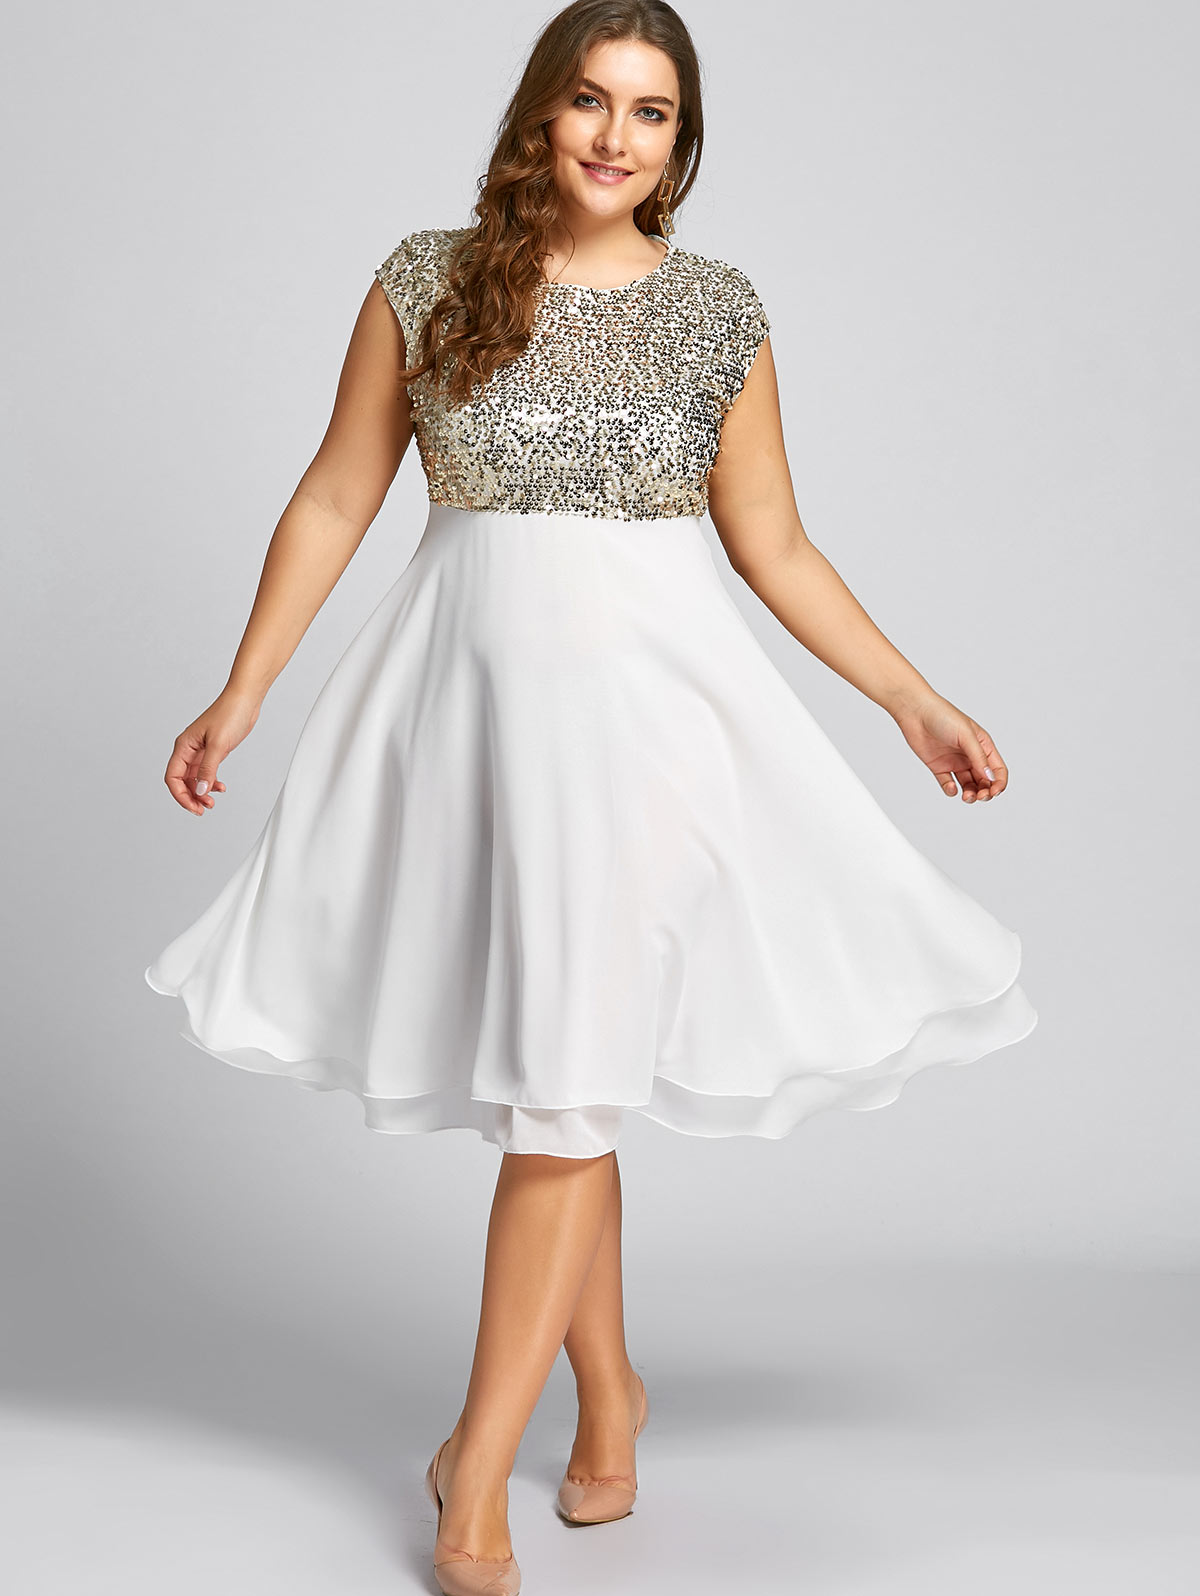 3714cff077340 Kenancy Plus Size Flounce Sequin Sparkly Cocktail Vintage Party Dress O  Neck Sleeveless Retro Dress Elegant Feminino Vestidos